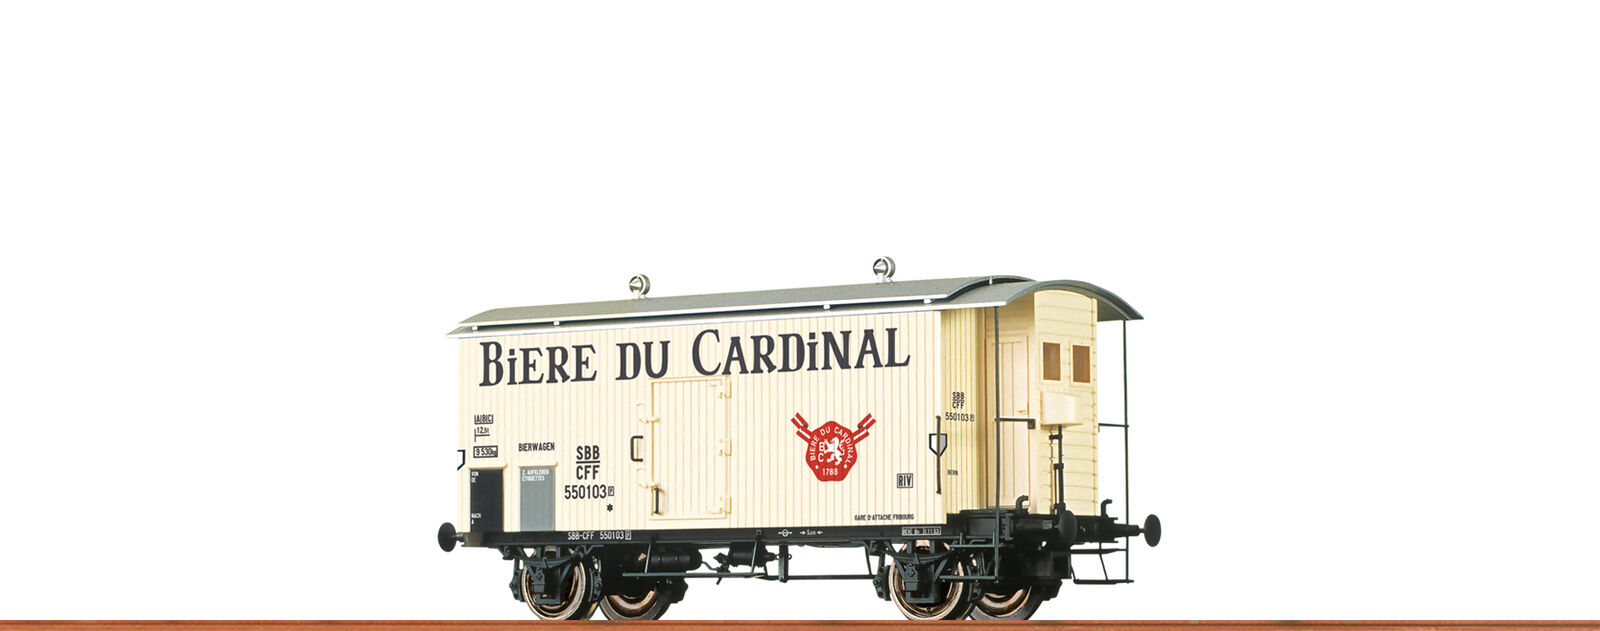 Brawa 47872 h0 goods k2, sbb, III, Cardinal dc